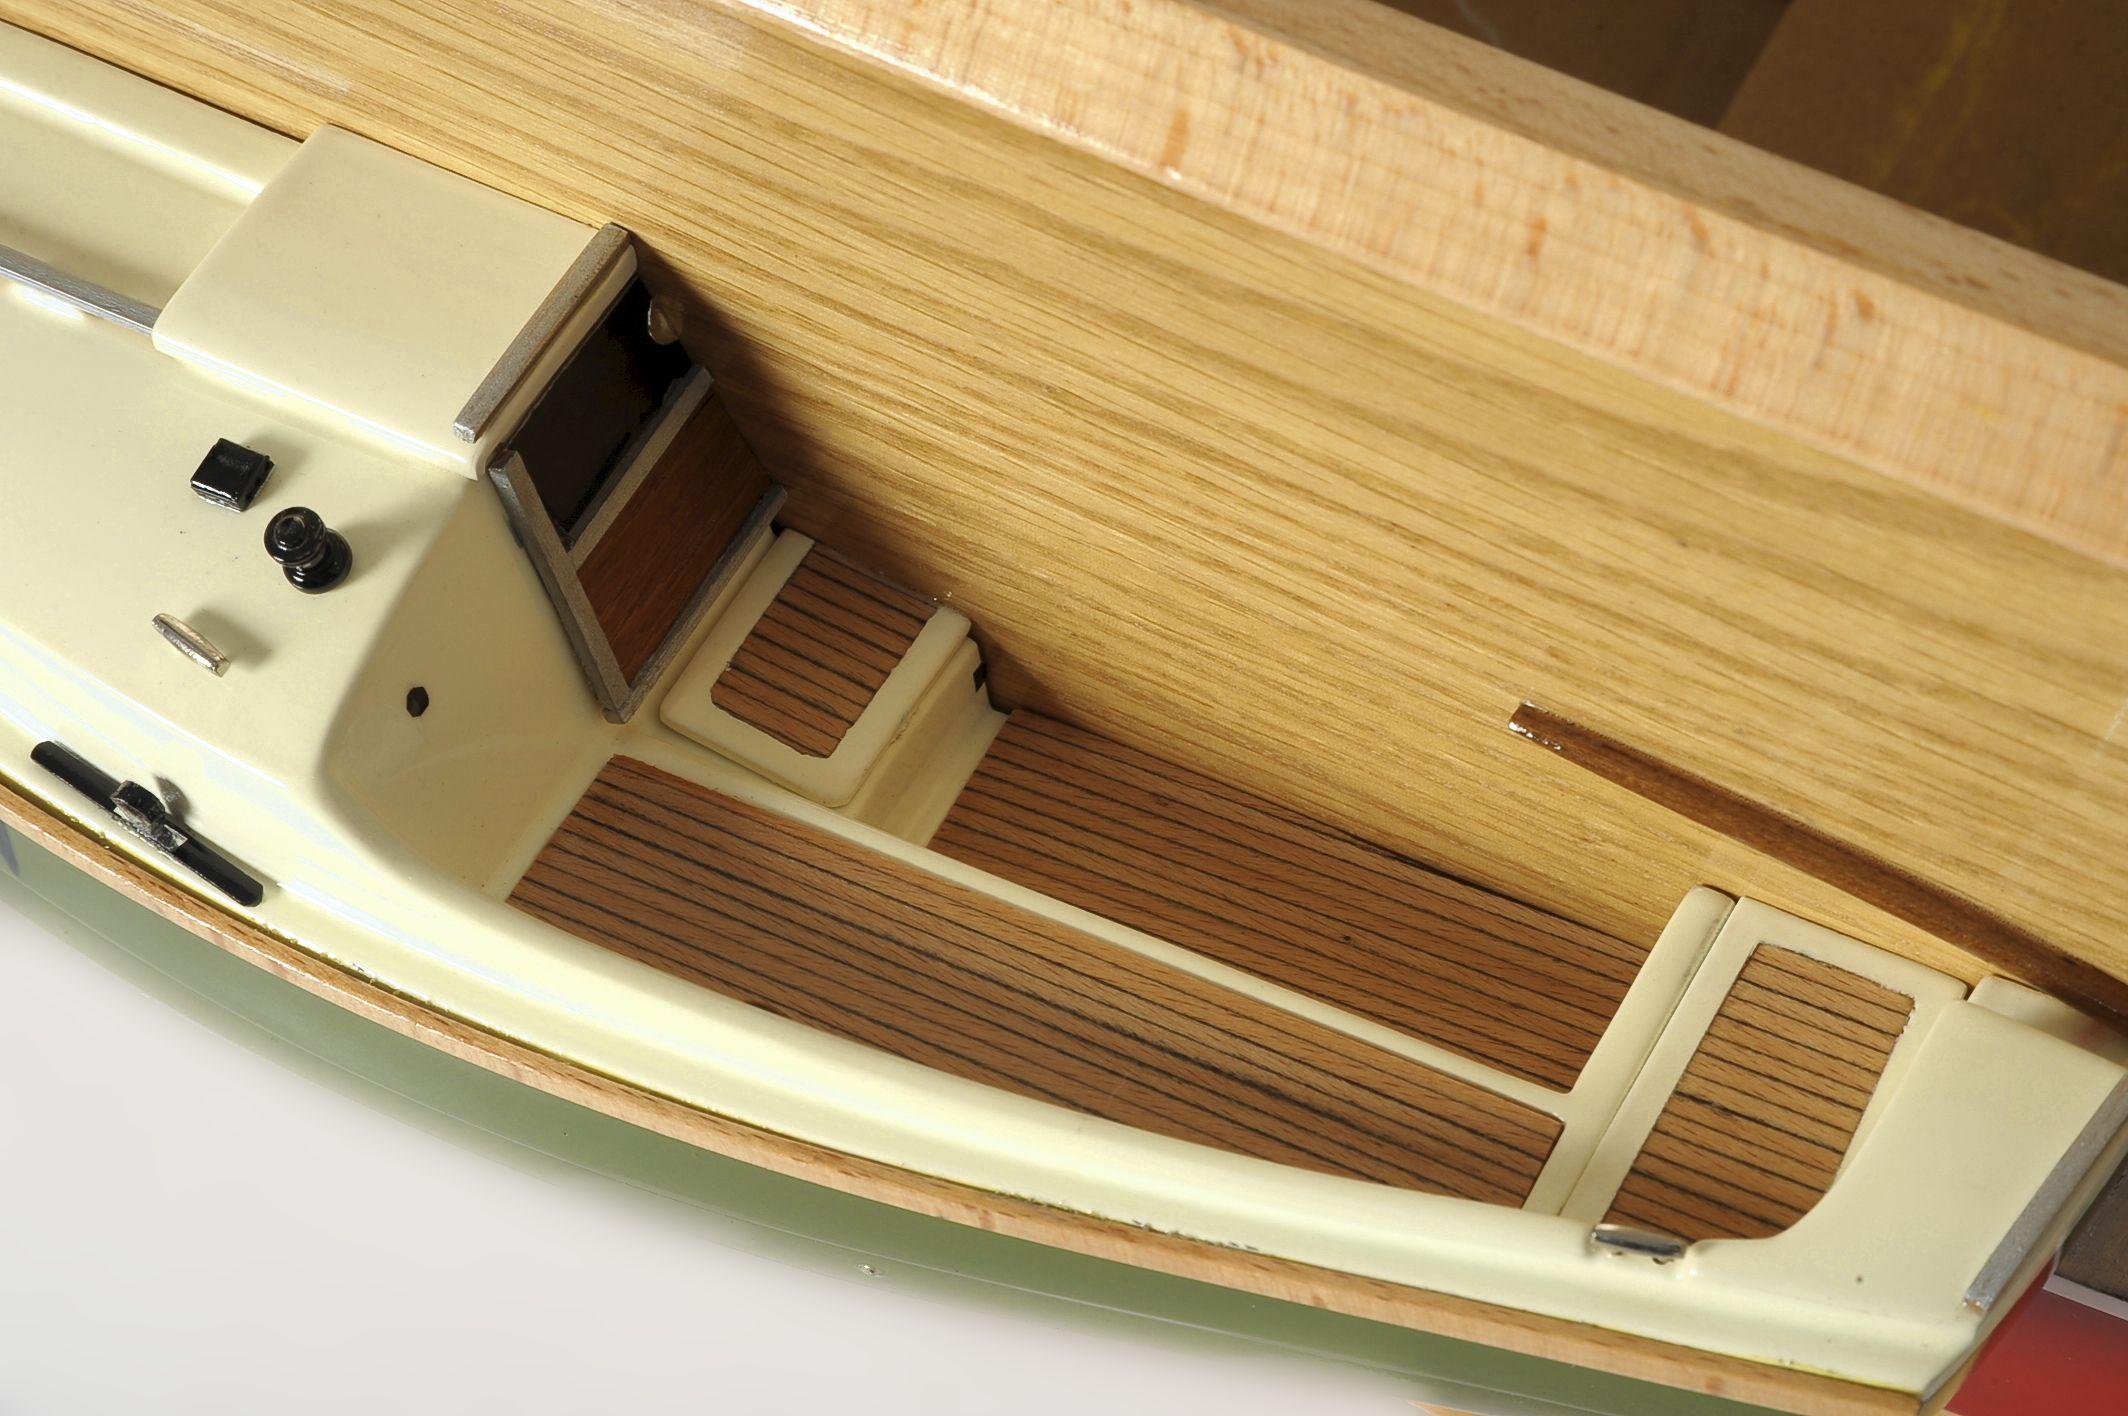 1516-8943-Cornish-Shrimper-Half-Model